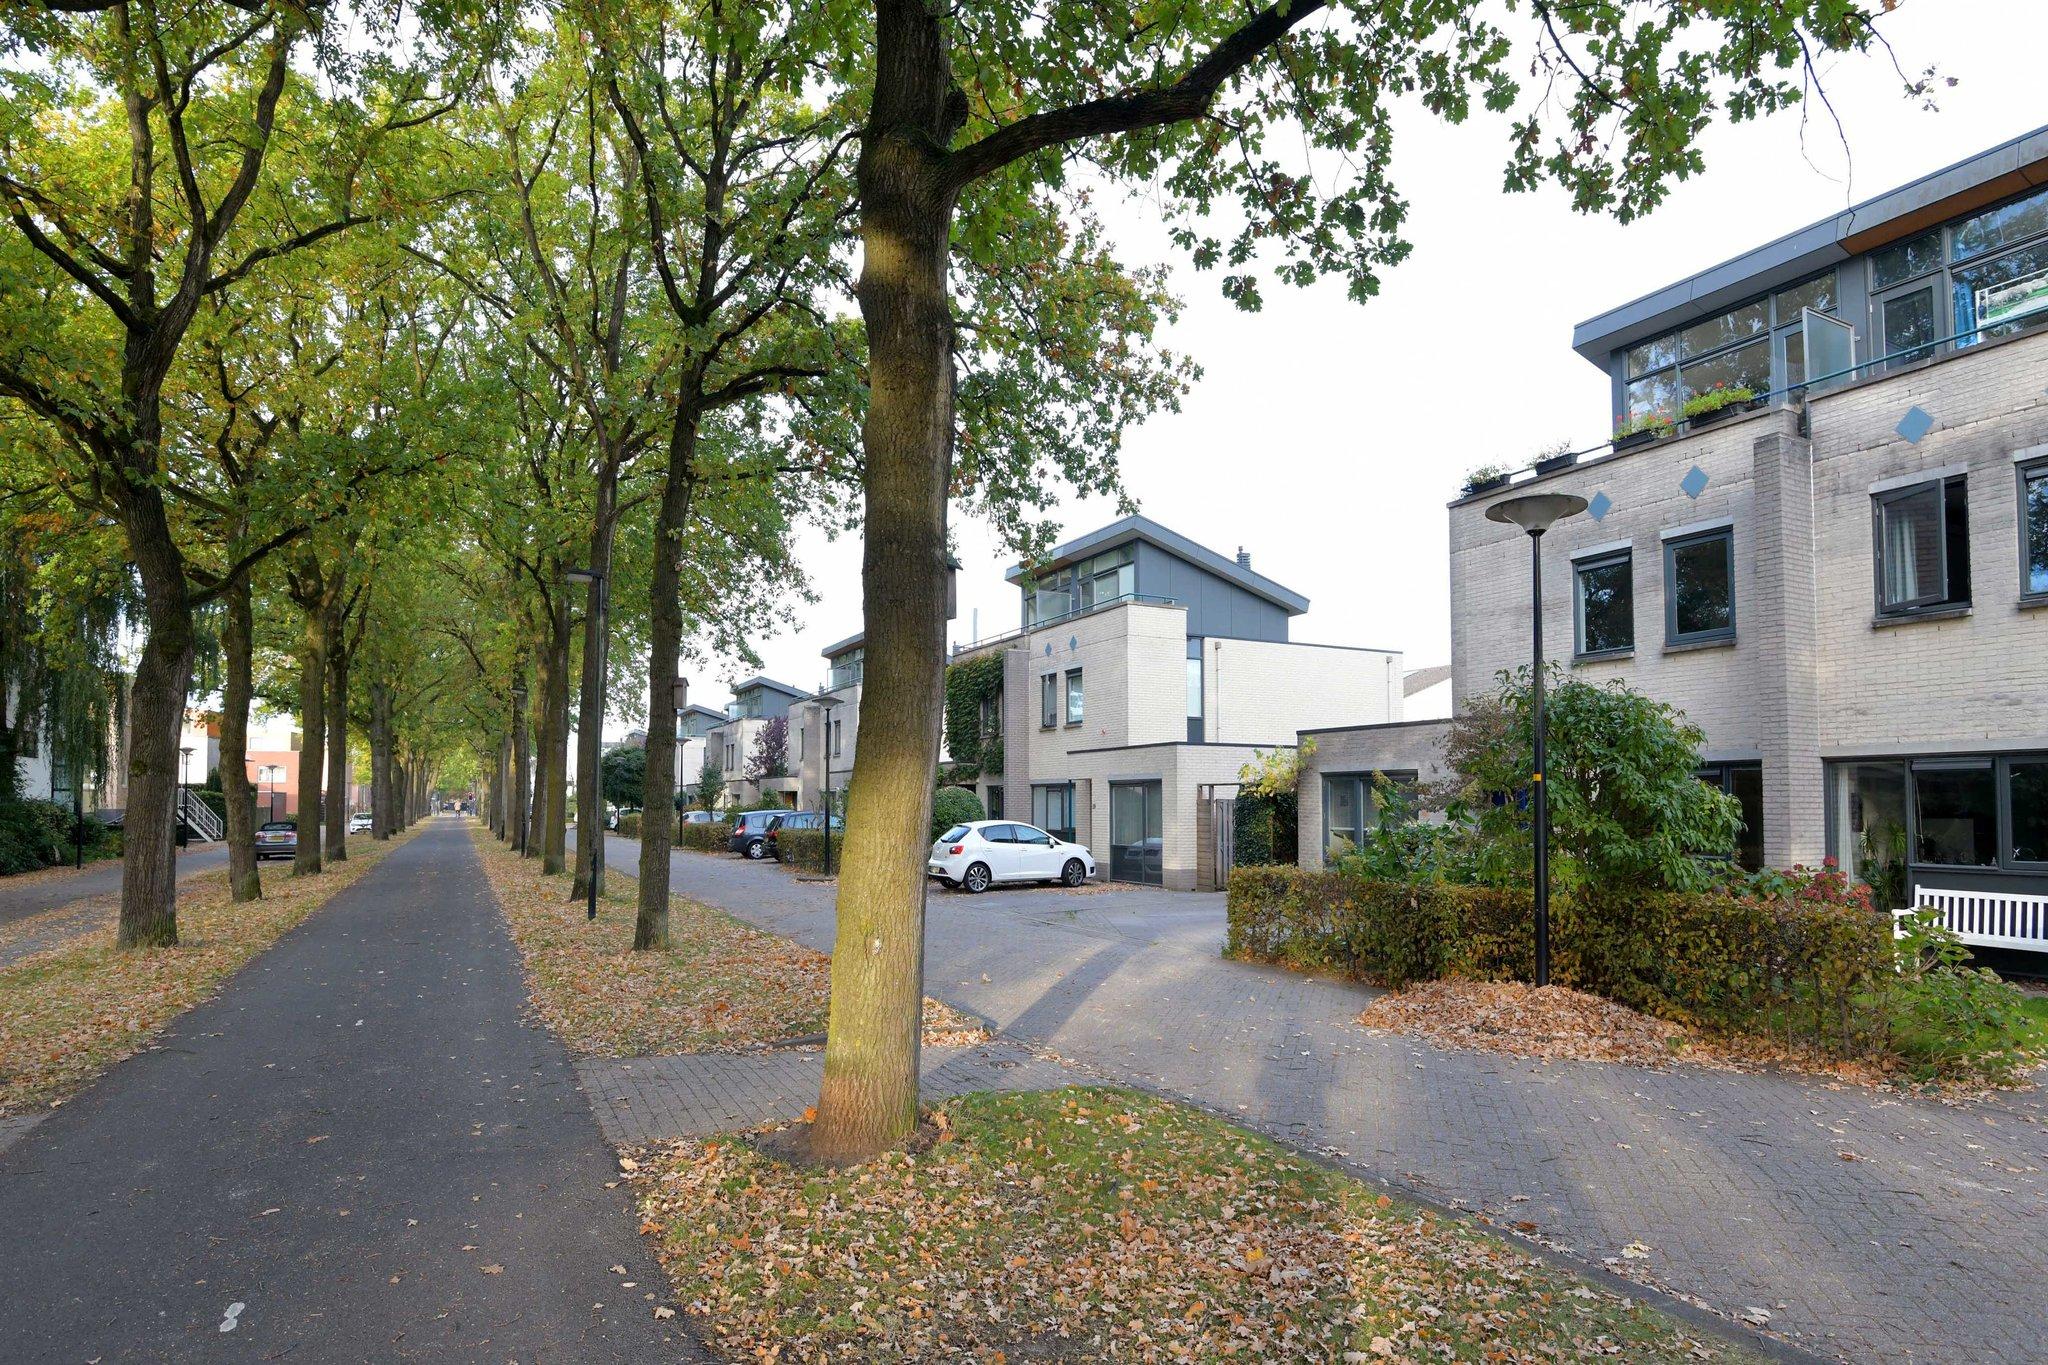 deventer-willem-landrestraat-4226710-foto-38.jpg